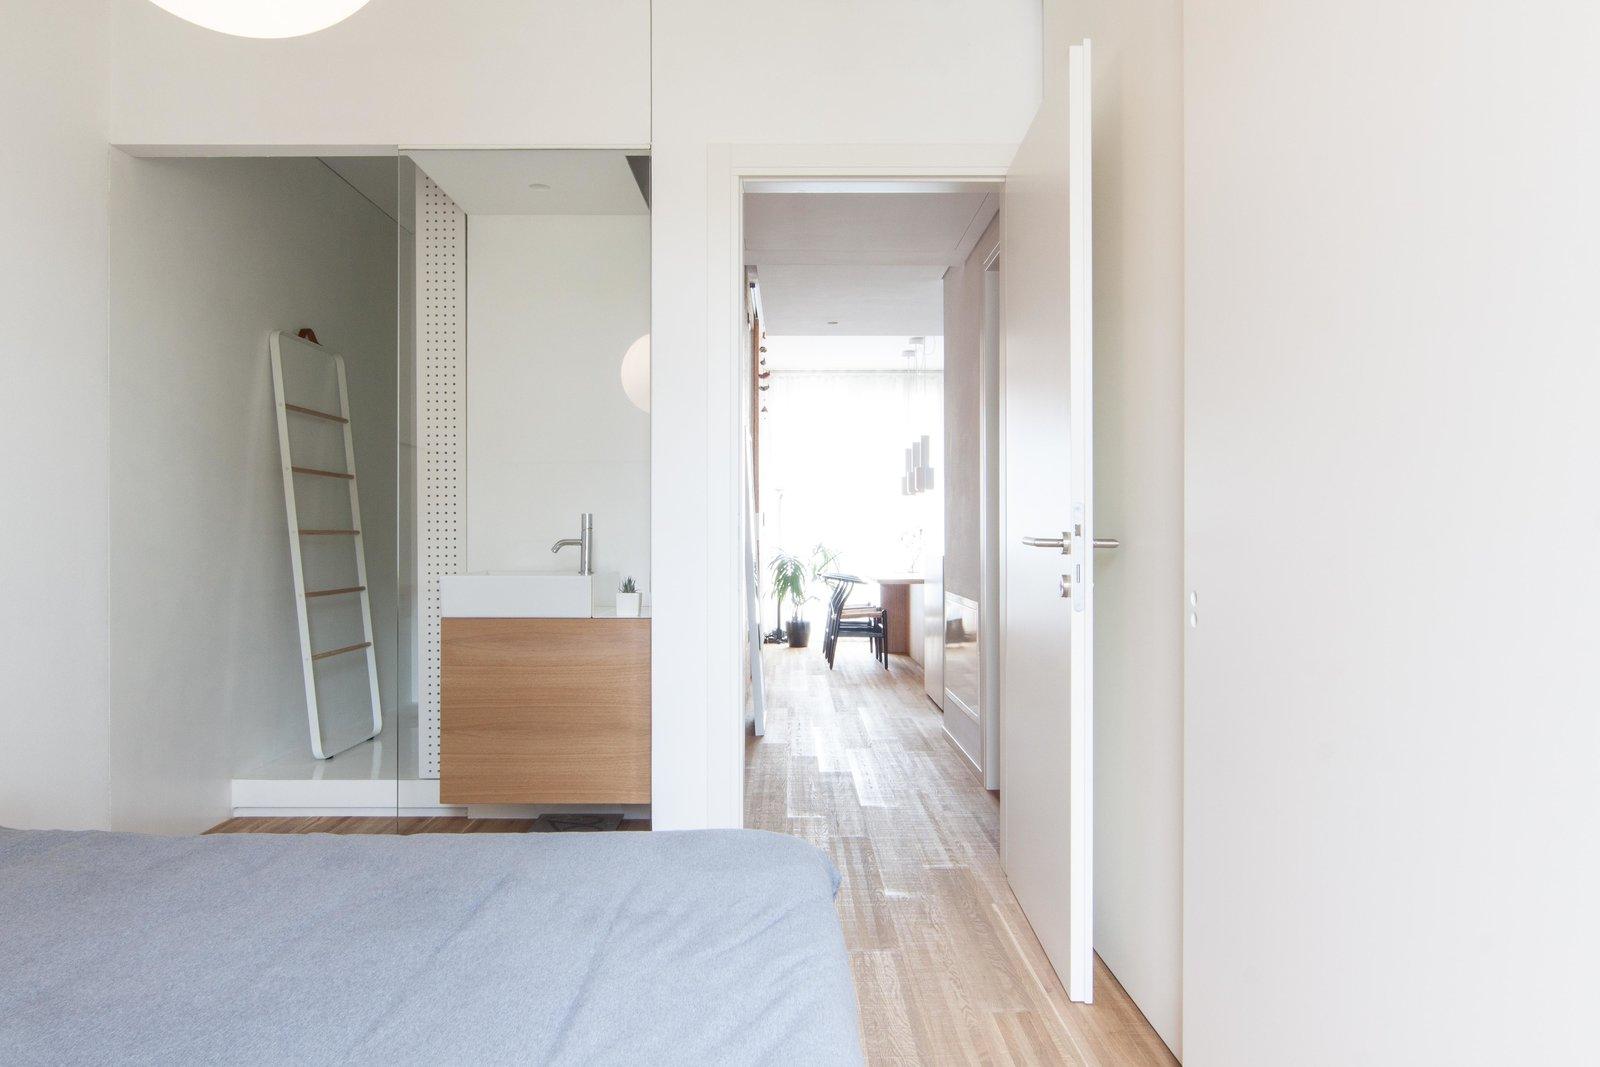 Bedroom, Bed, Pendant Lighting, Dresser, Wardrobe, Ceiling Lighting, and Medium Hardwood Floor  Interior LP by Didonè Comacchio